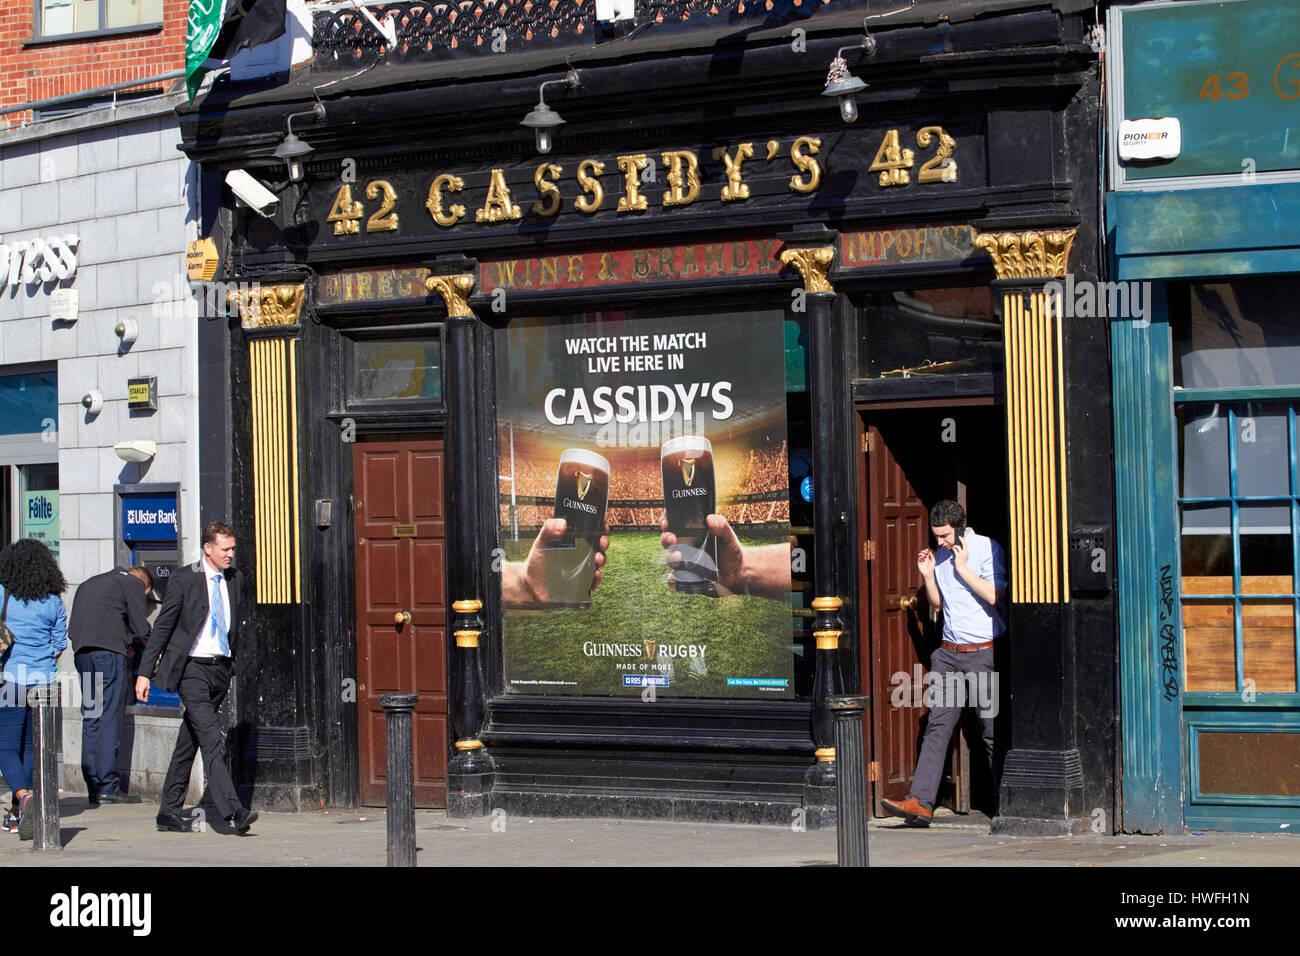 Cassidys bar 42 untere Camden Street in Dublin Republik Irland Präsident Bill Clinton hatte hier einmal einen Stockbild